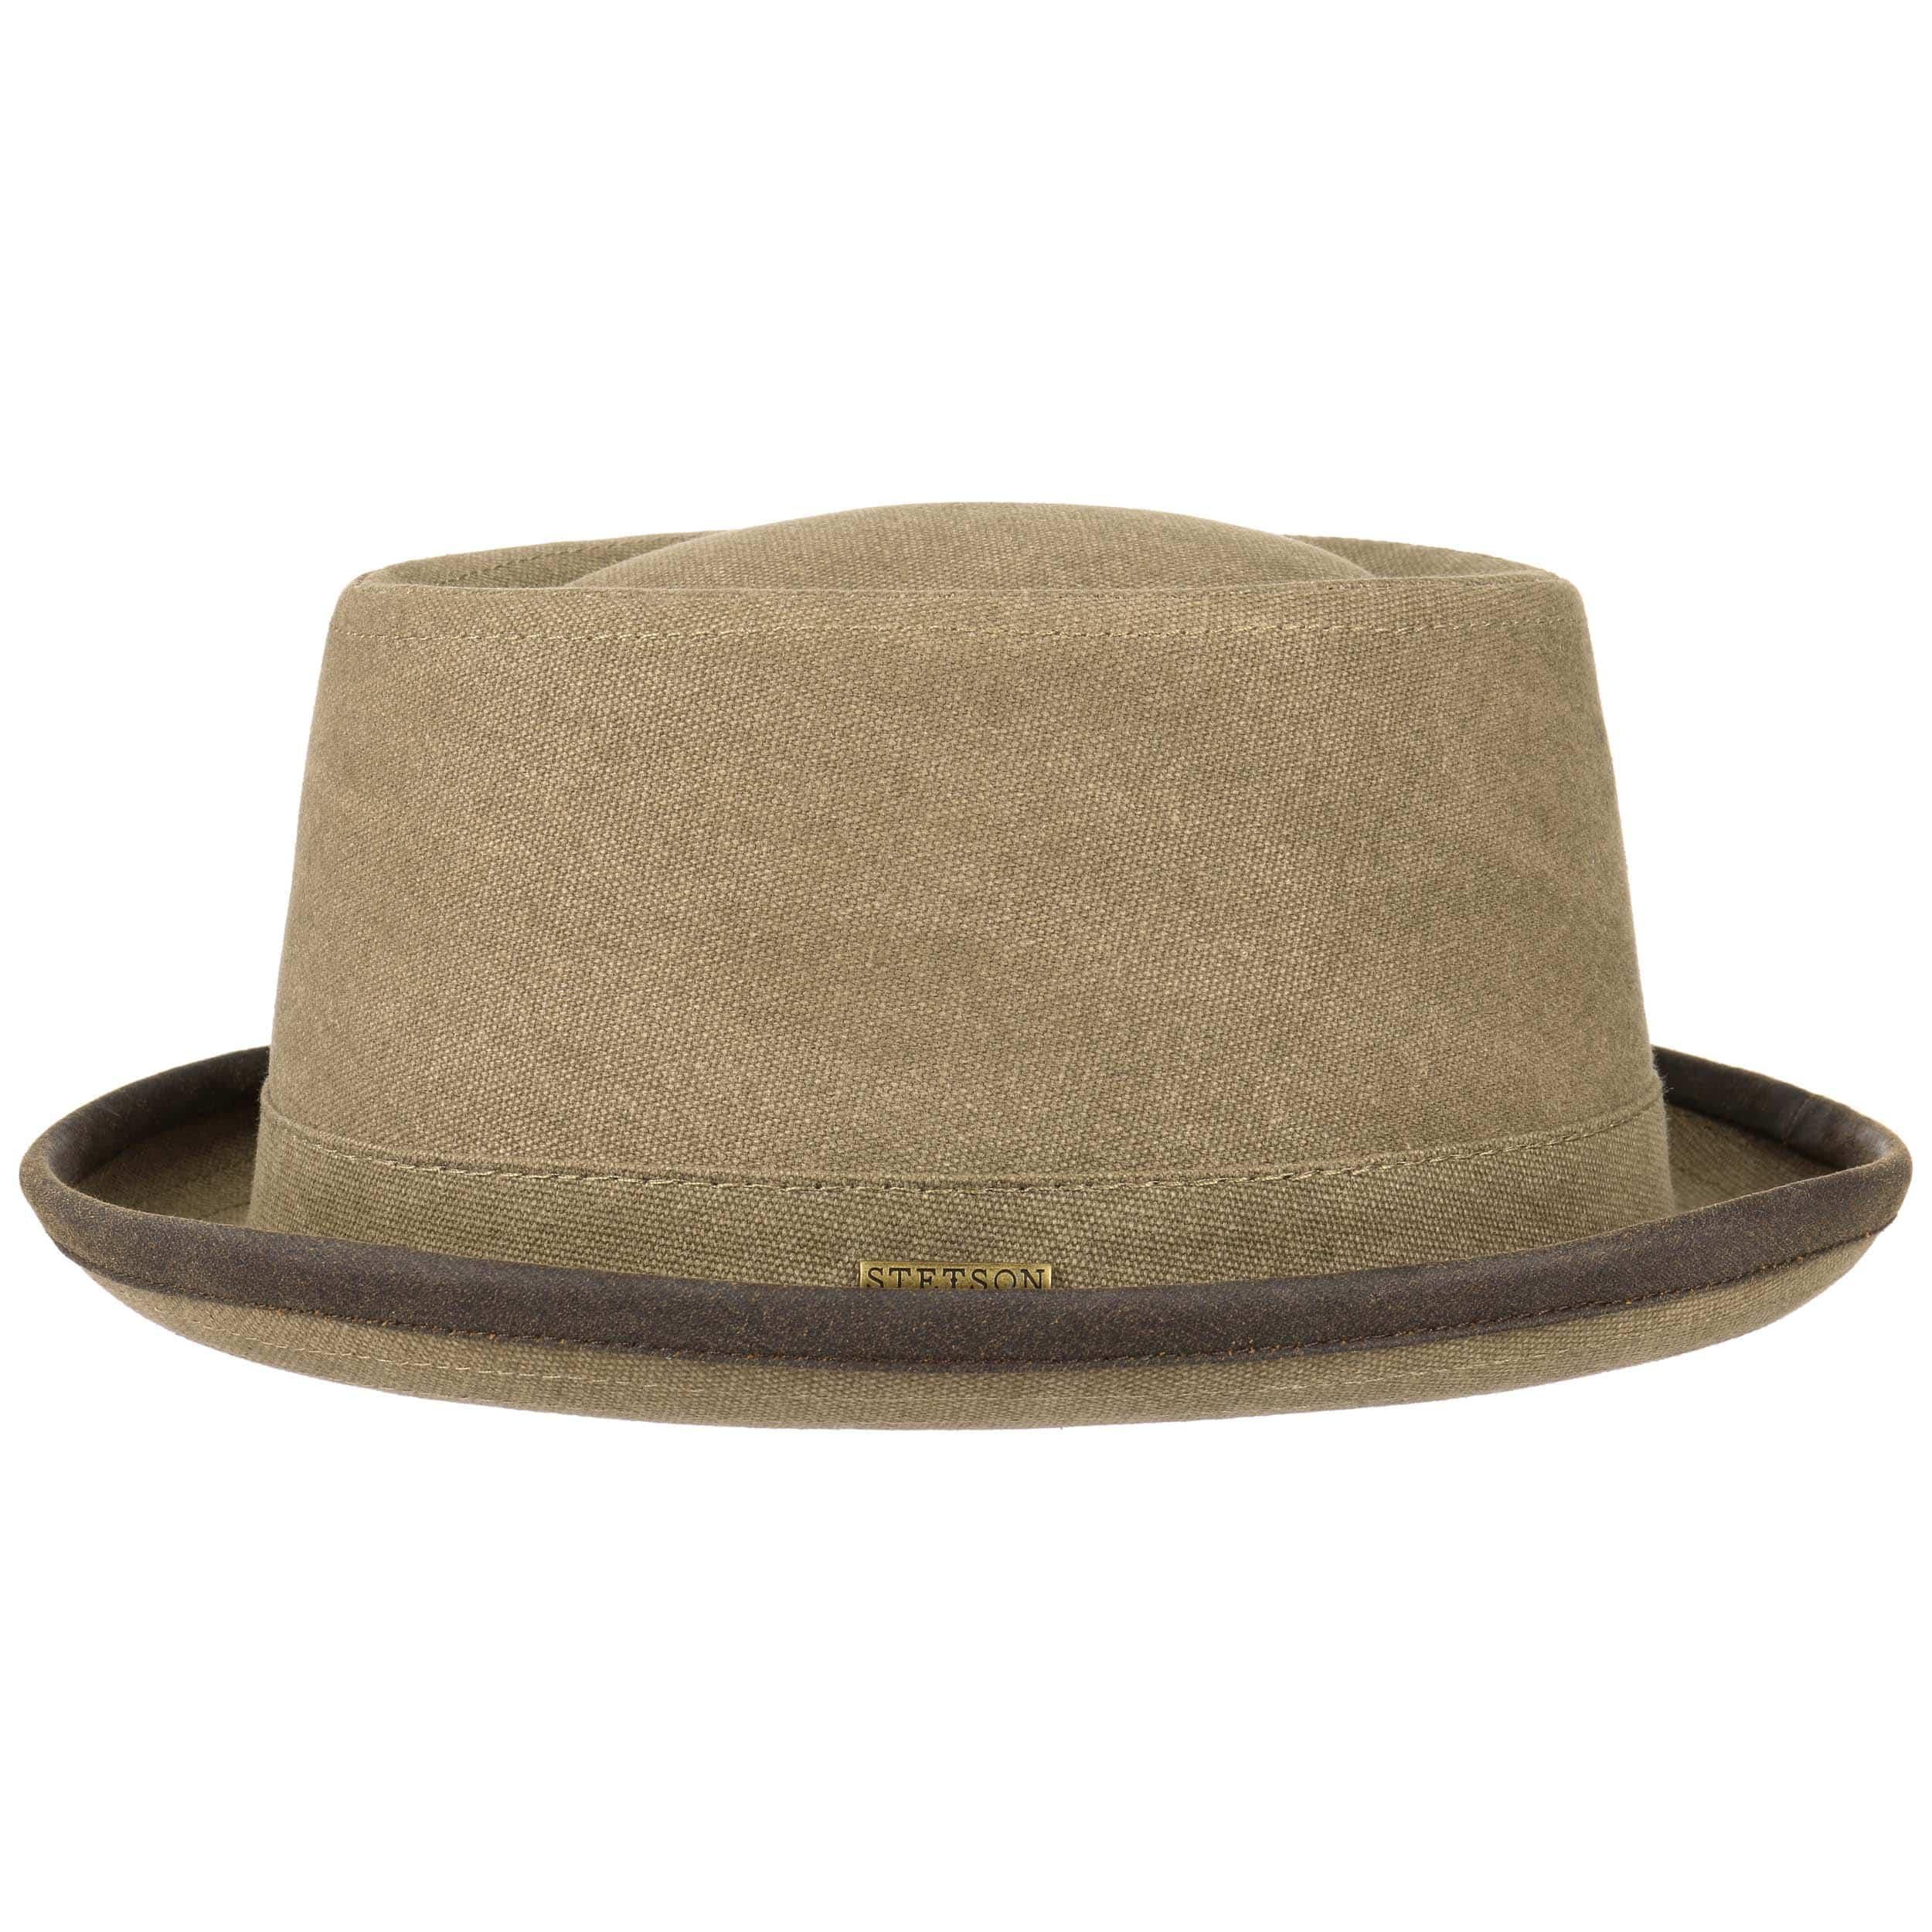 Canvas Pork Pie Hat by Stetson - light olive 1 speical  73a62 1c5e5 Sales  ... 03fac9c3b30